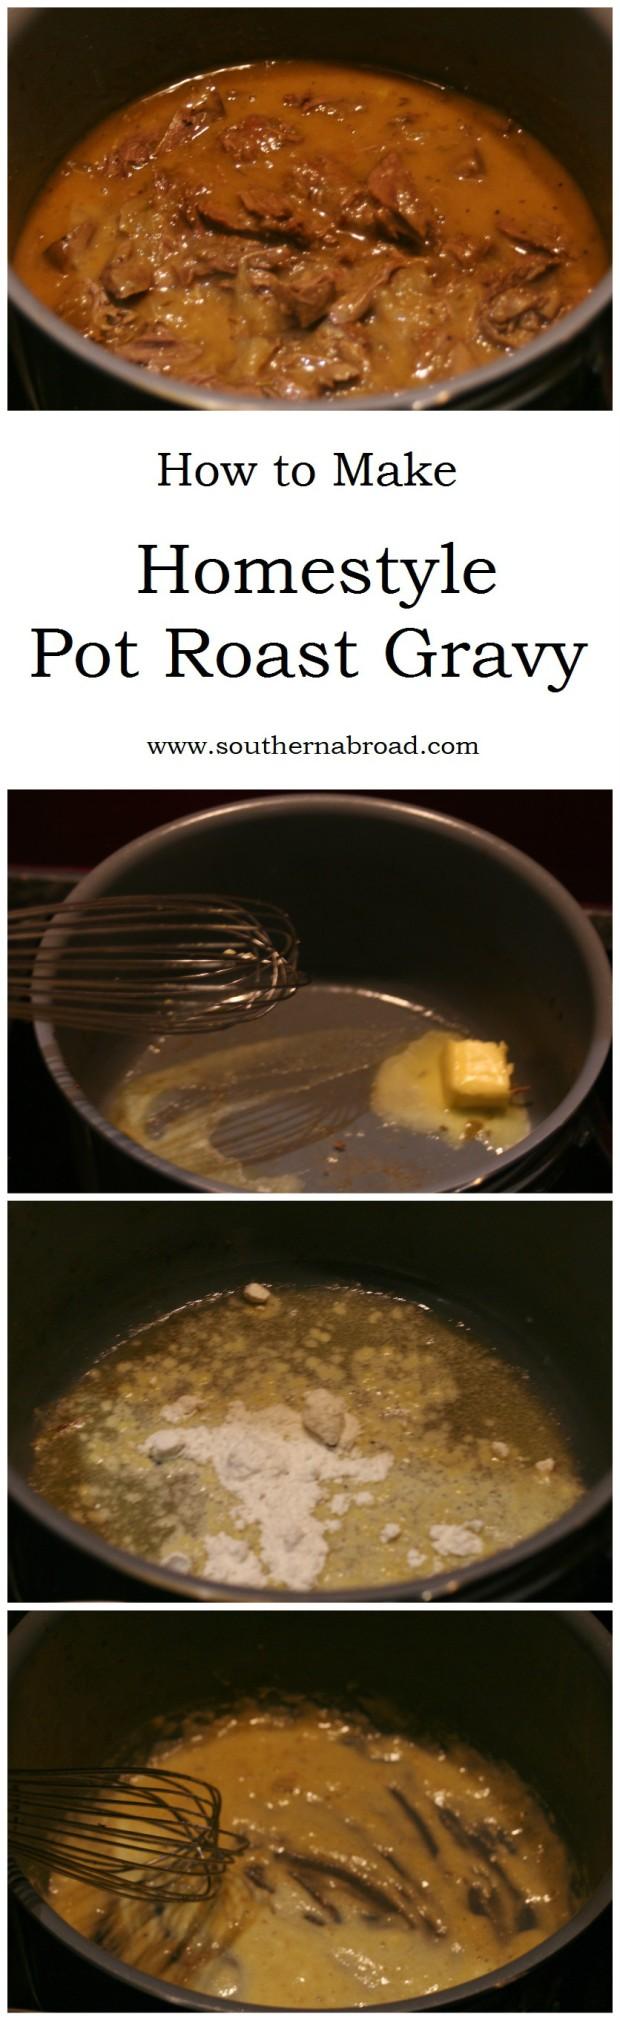 Pot Roast Gravy Recipe